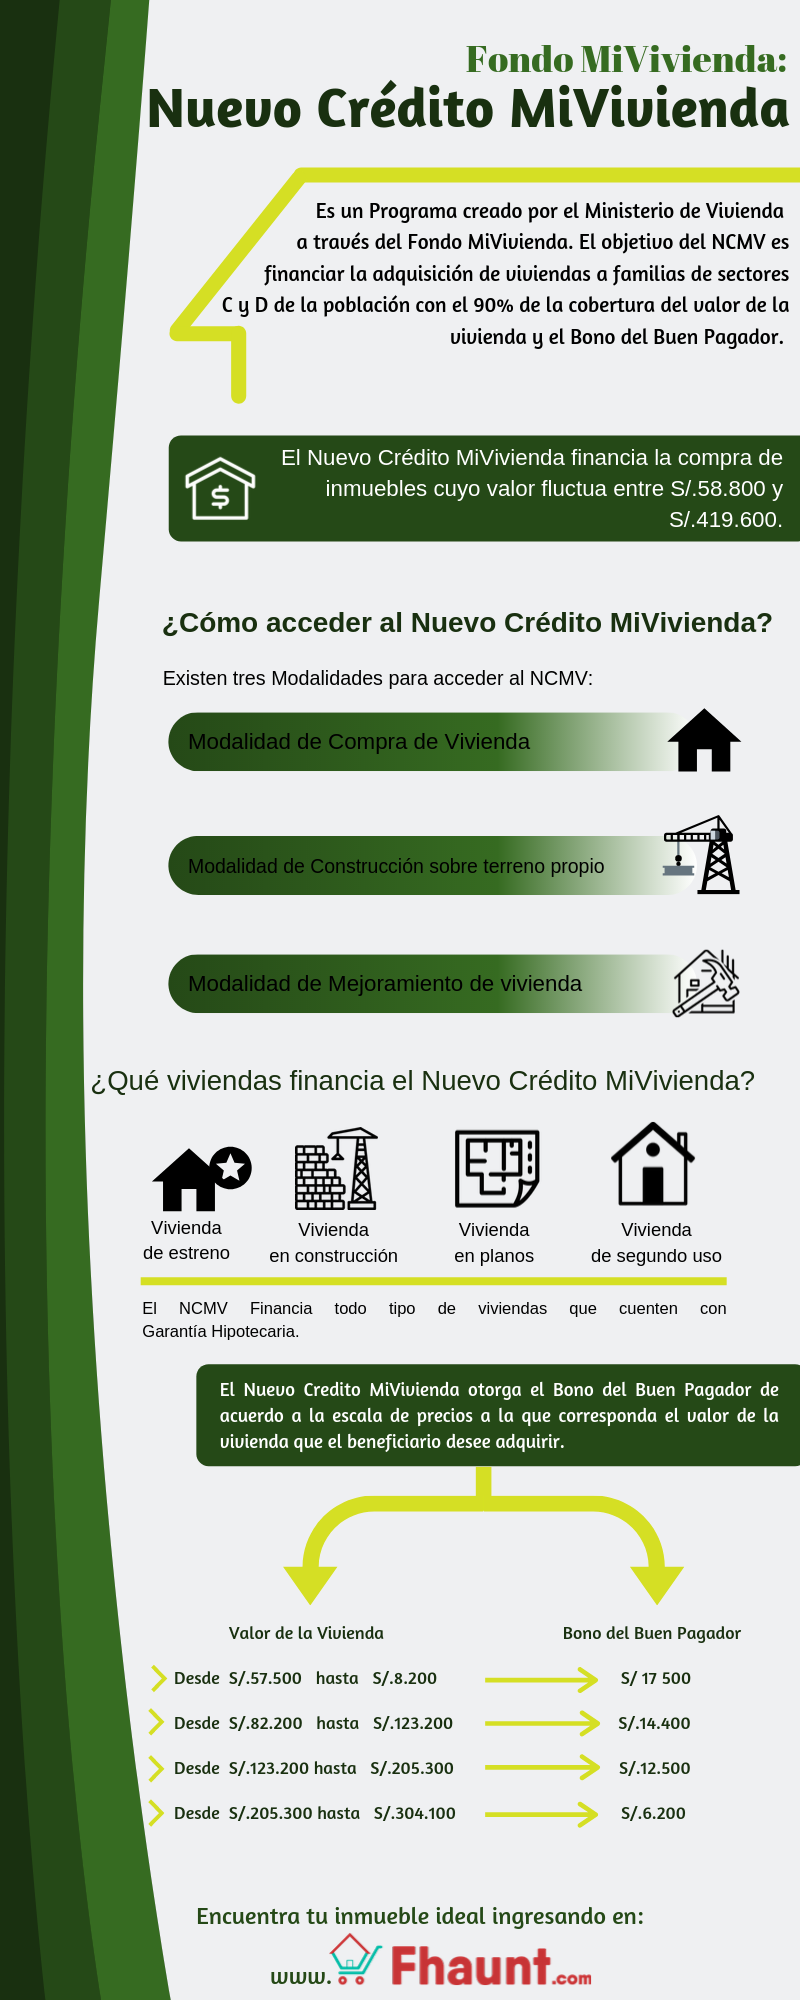 Infografia sobre Nuevo Crédito MiVivienda